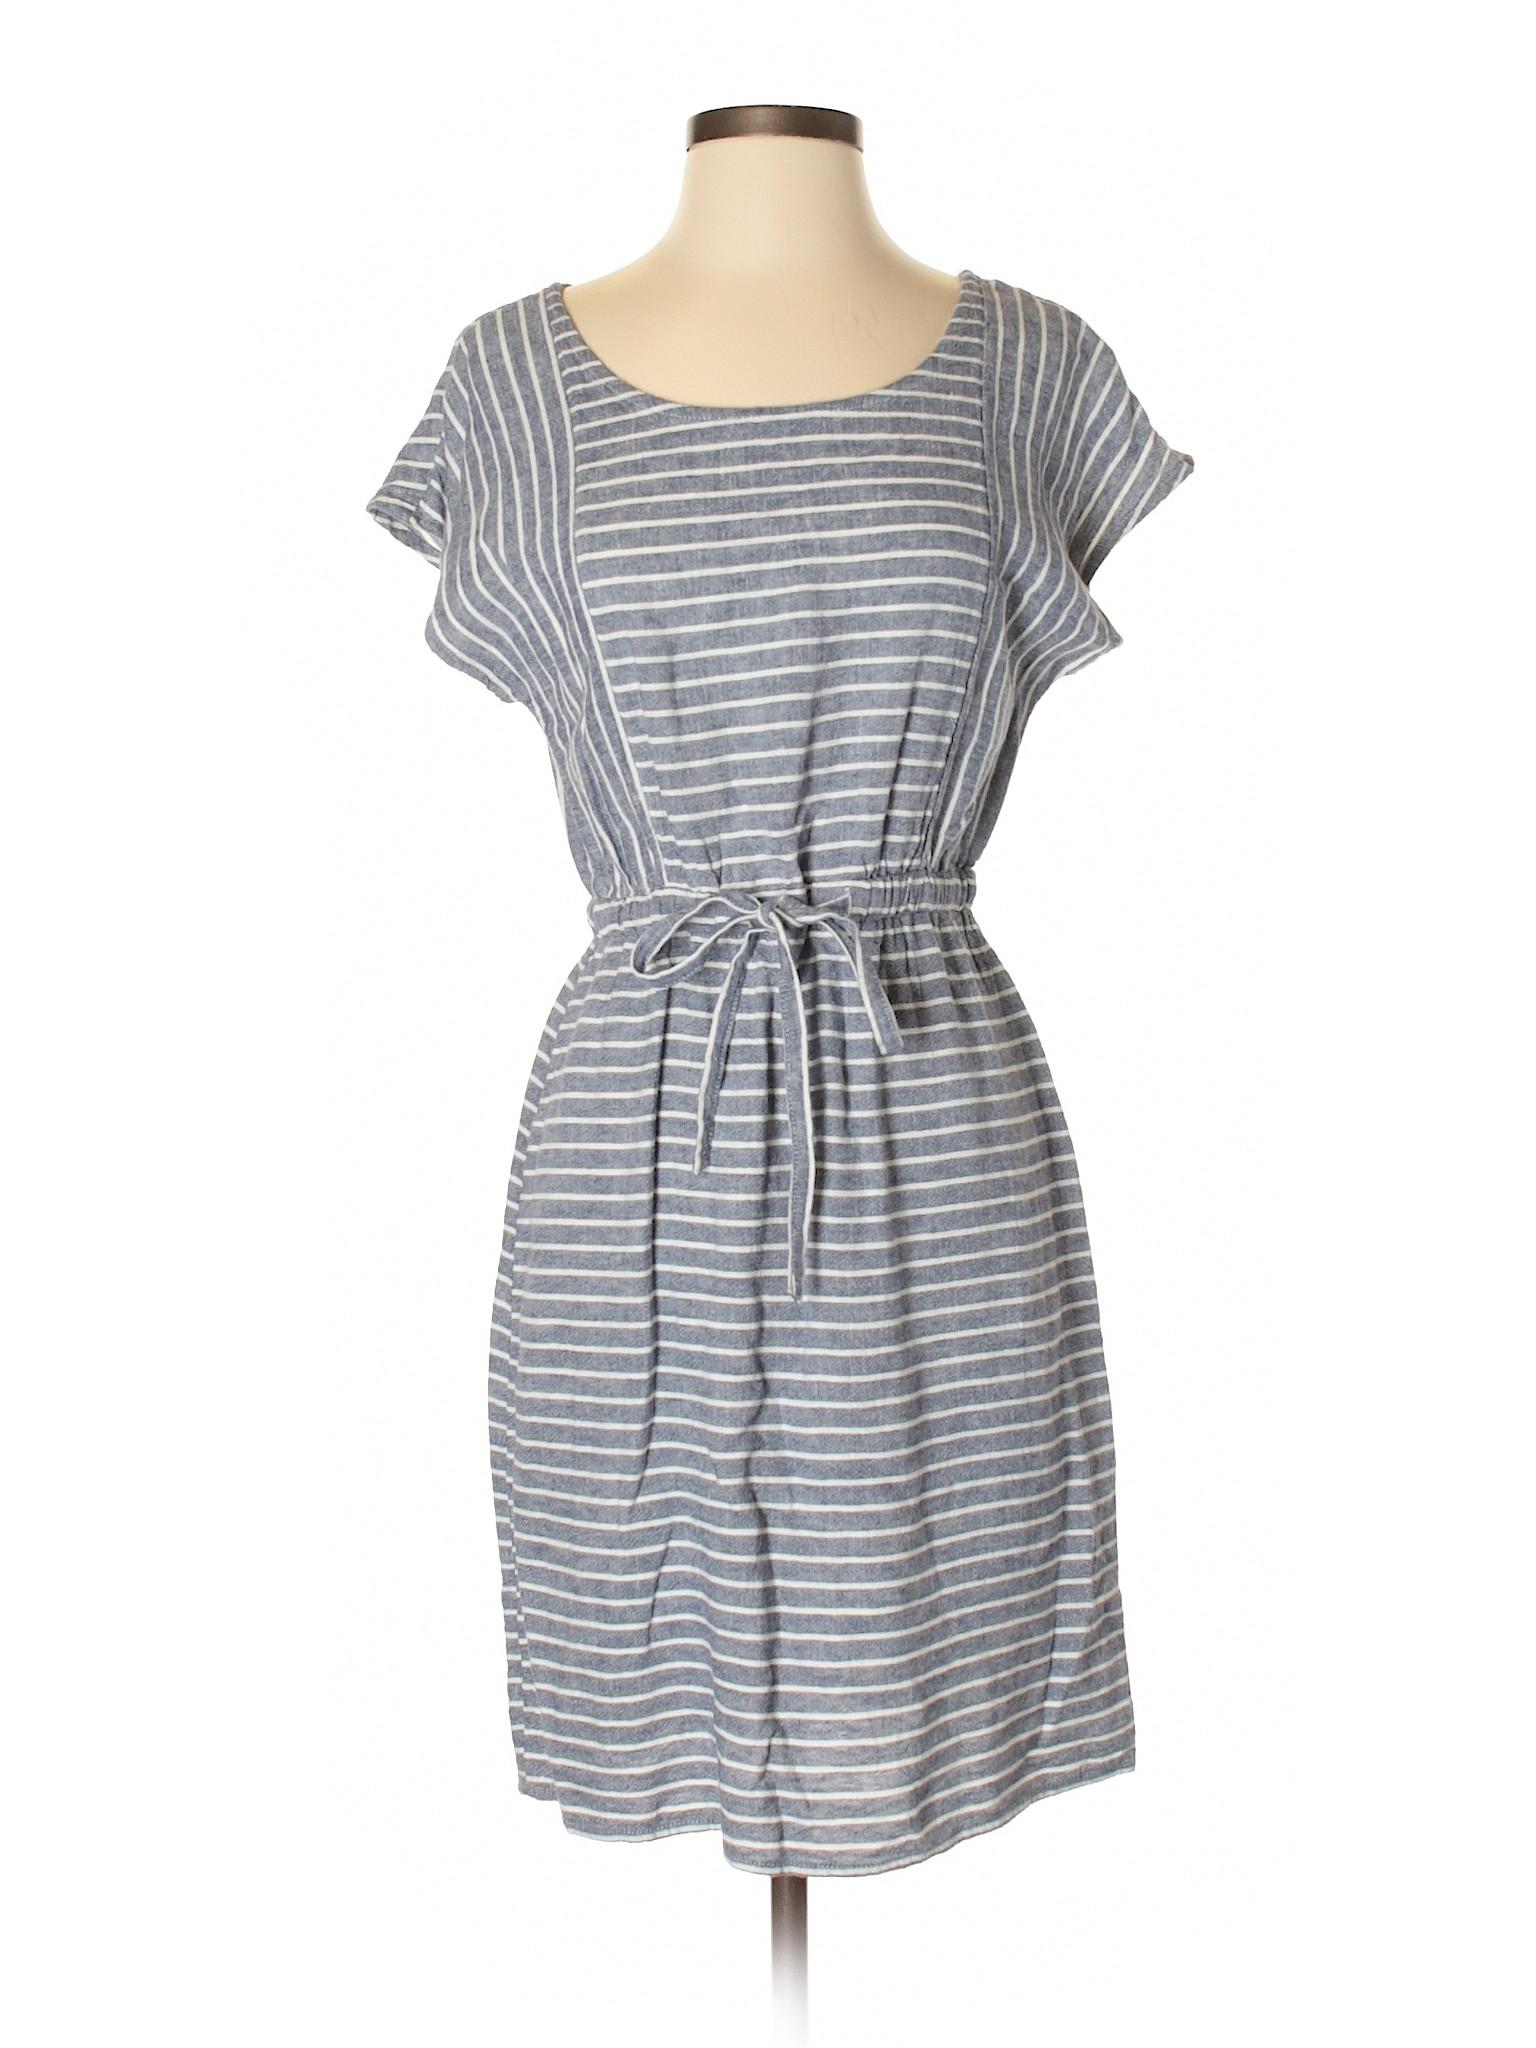 Boutique Casual Old winter Navy Dress aRranqtx